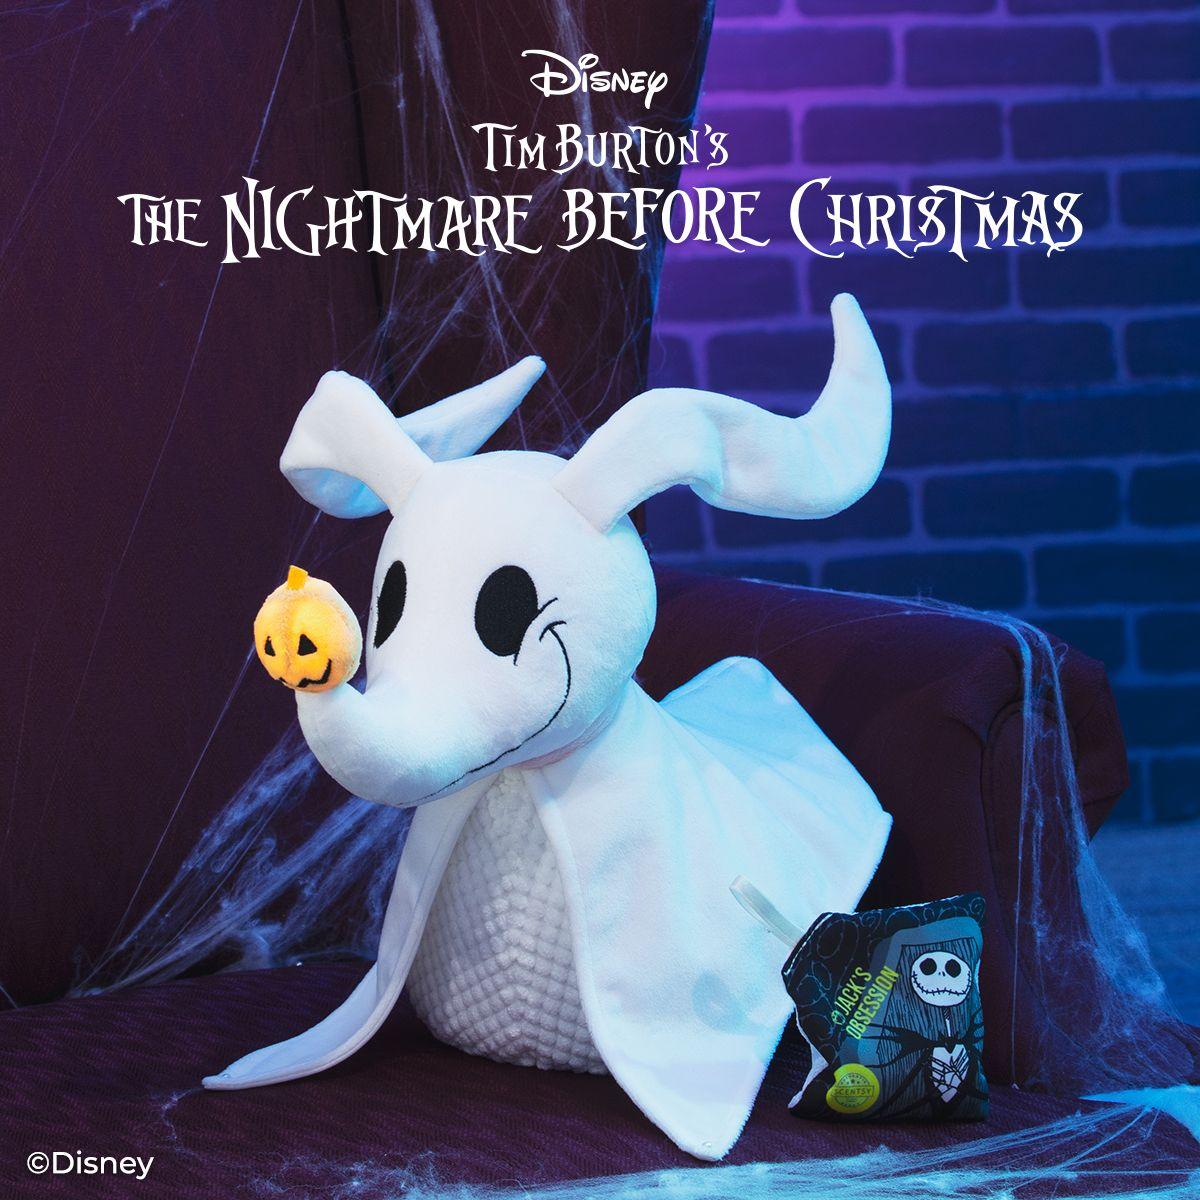 Zero Scentsy Buddy The Nightmare Before Christmas